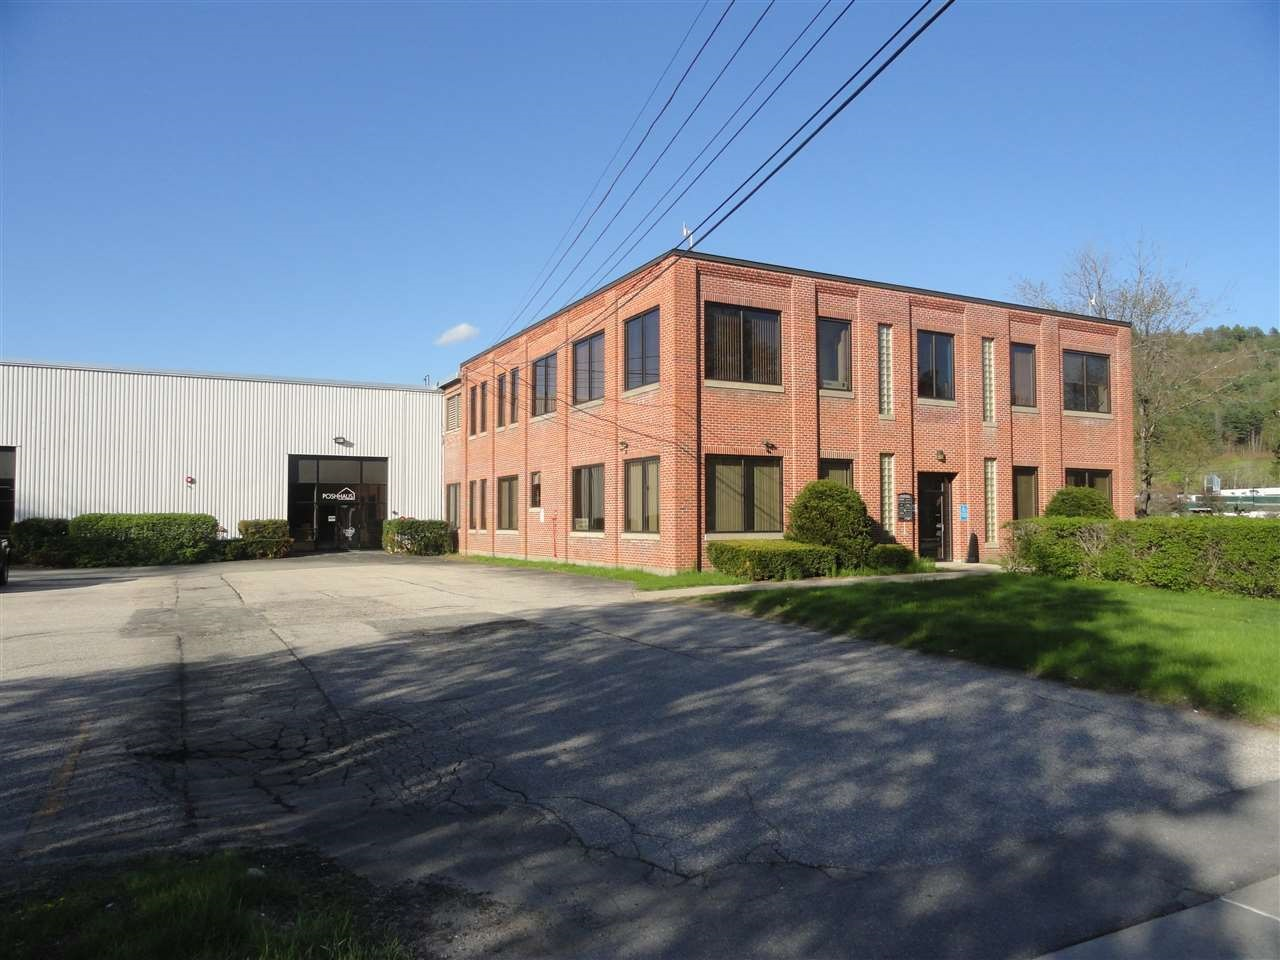 310 Marlboro Street, Keene, NH 03431